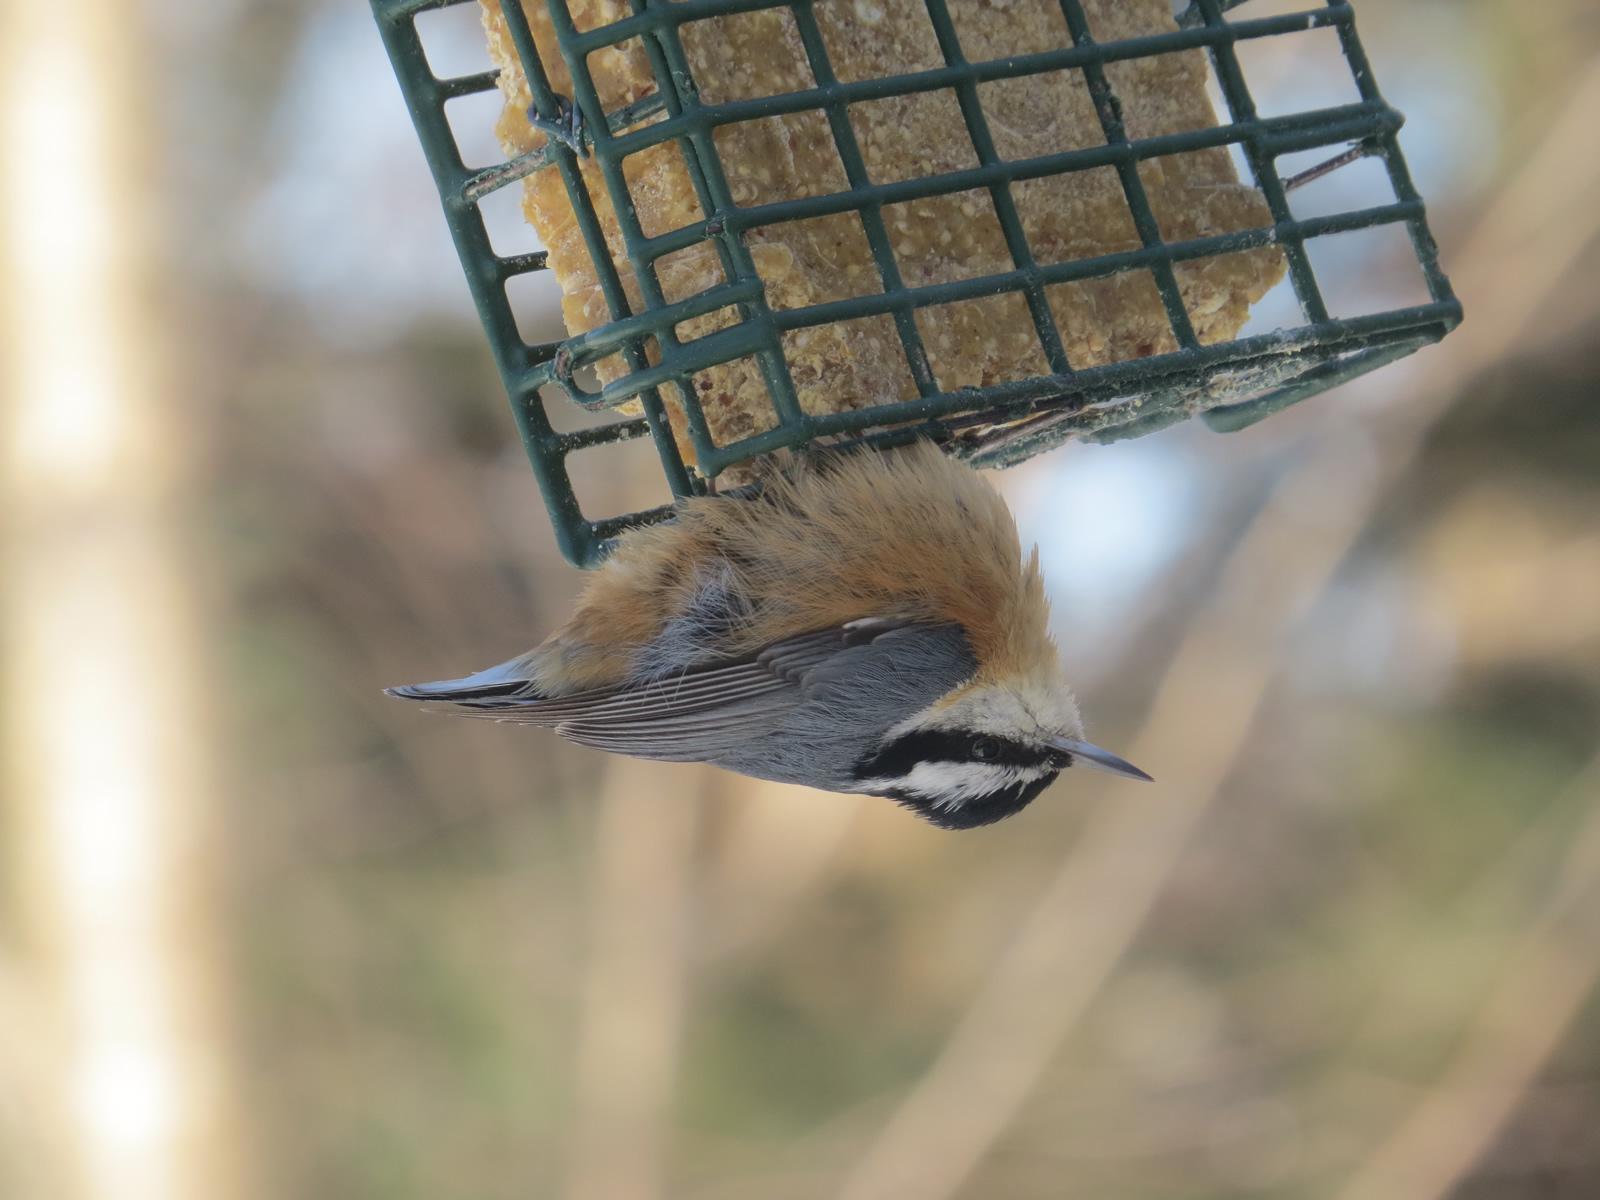 Glenn Hodgkins/Great Backyard Bird Count